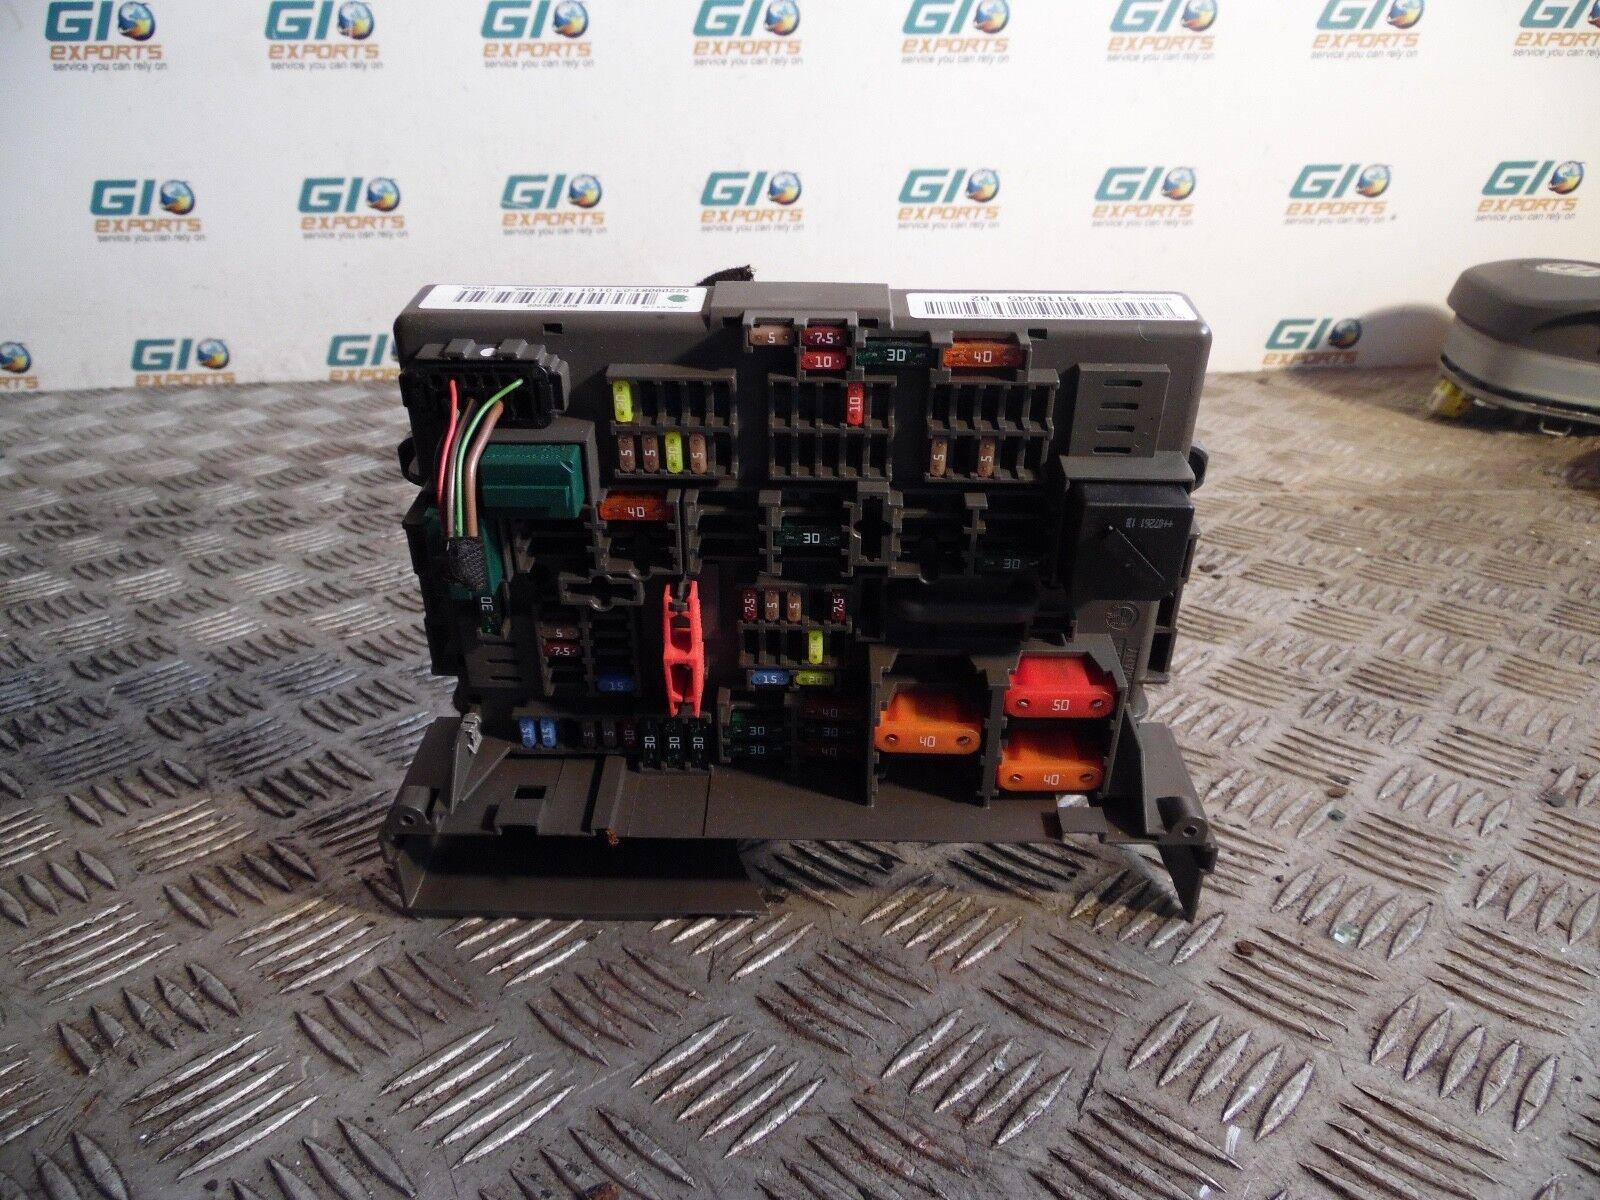 hight resolution of bmw 1 series fuse box 9119446 05 e82 118d fuse box 10688710 b26